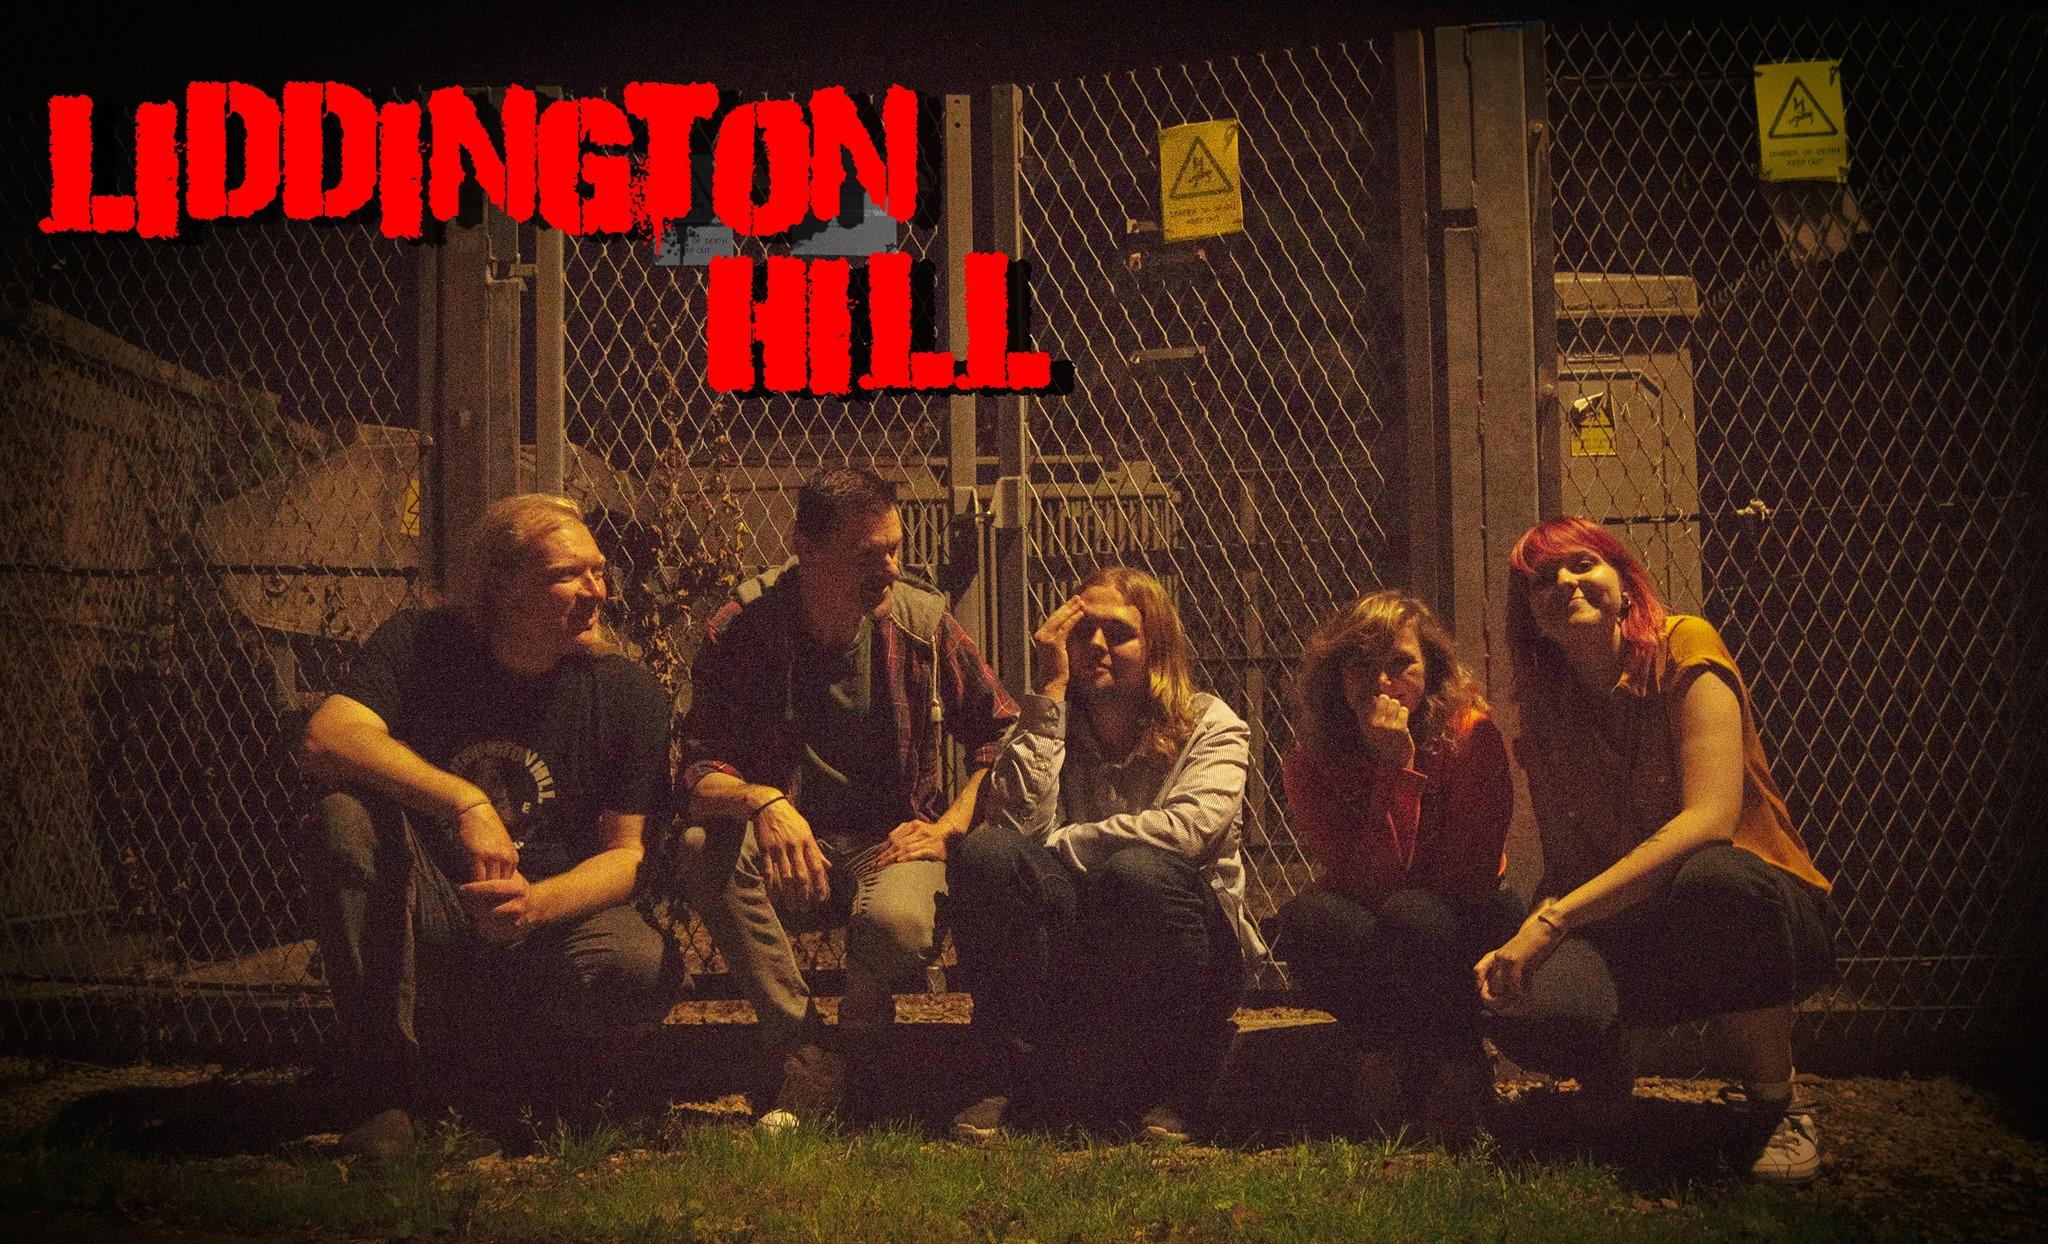 Liddington Hill Celtic Punk!